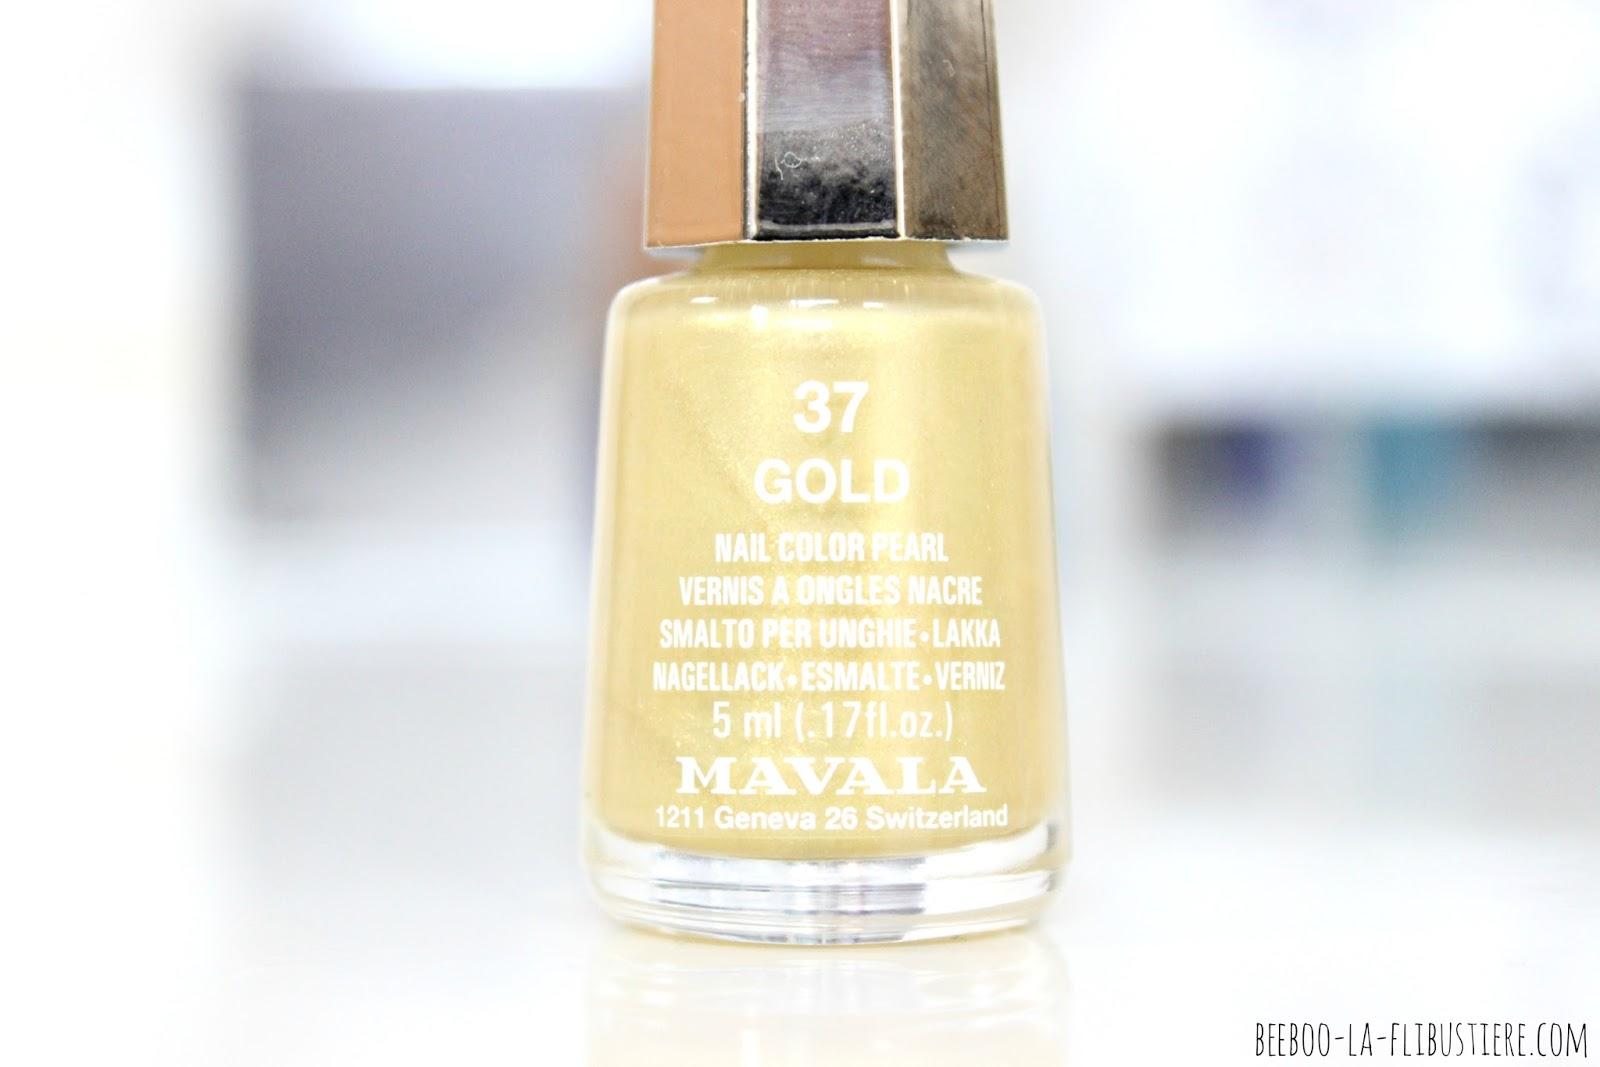 vernis n°37 gold mavala